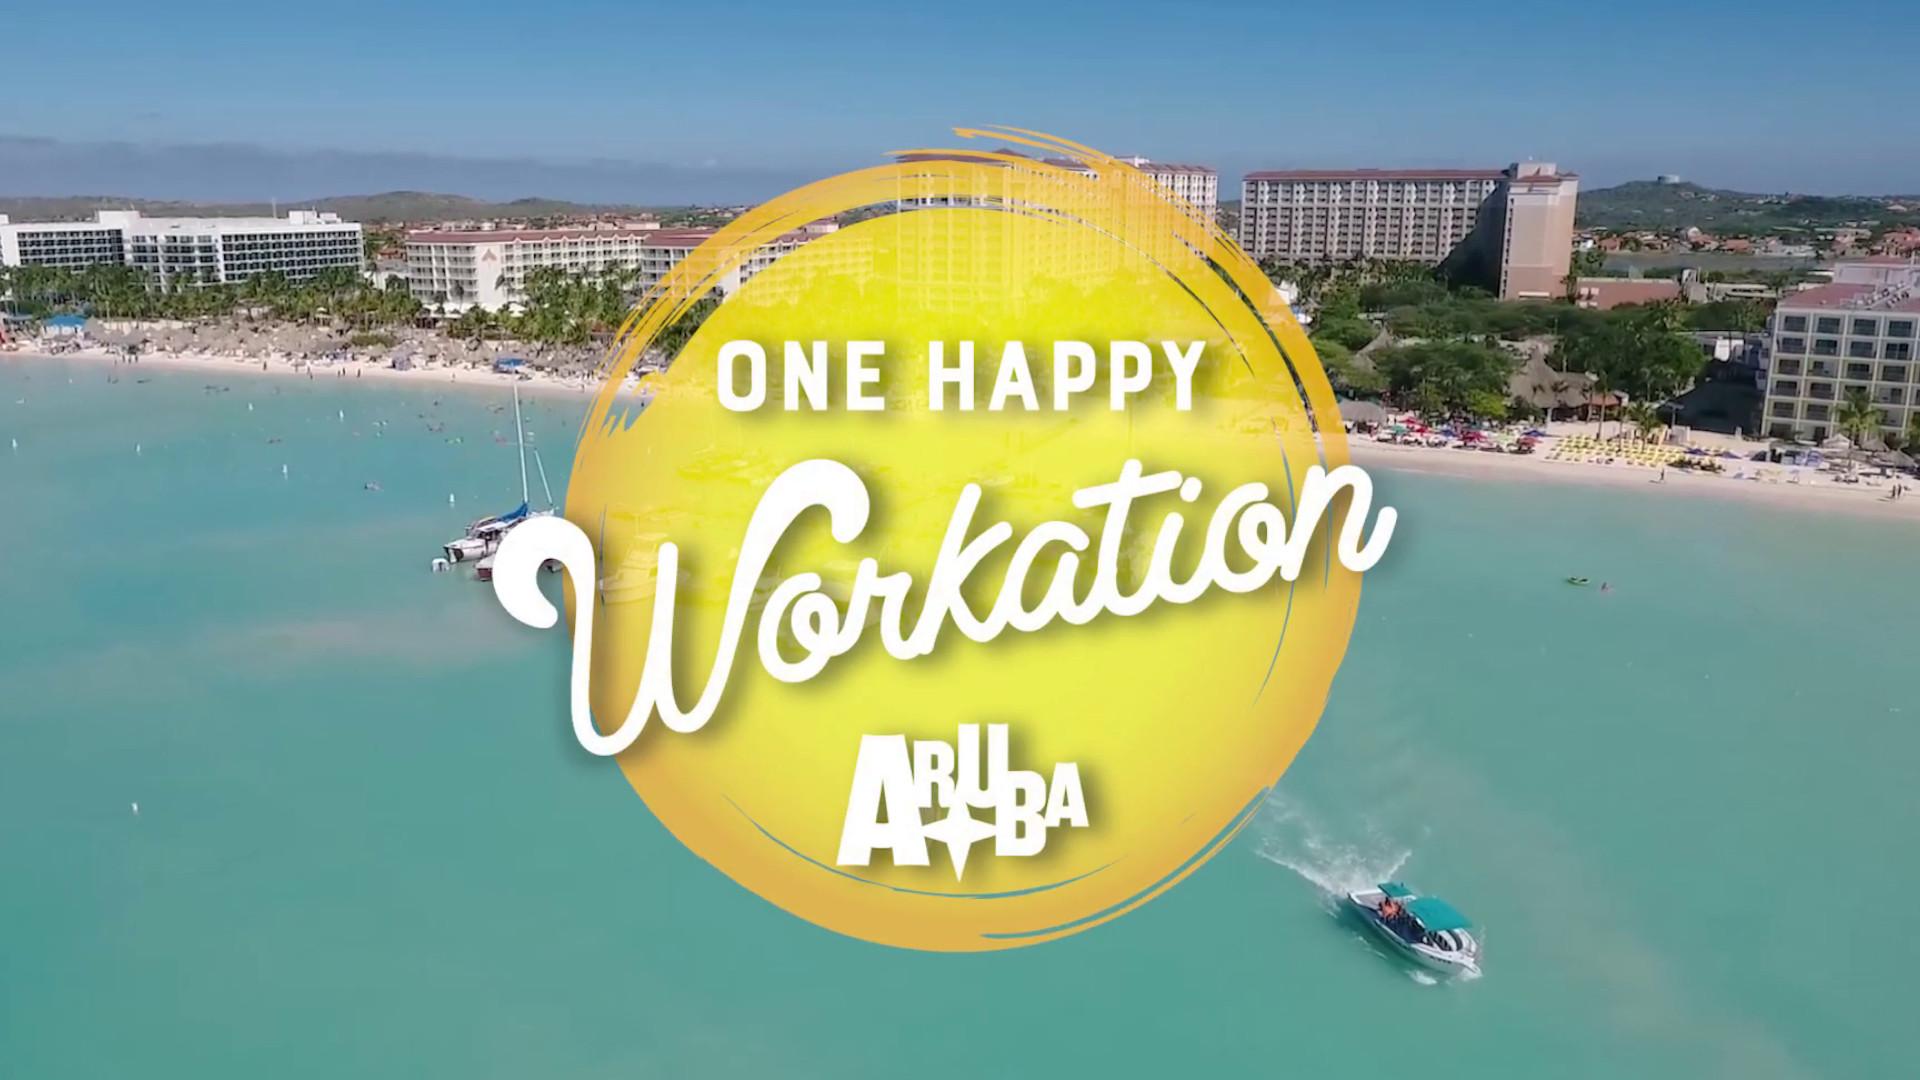 One Happy Workation, Remote Work Program of Aruba